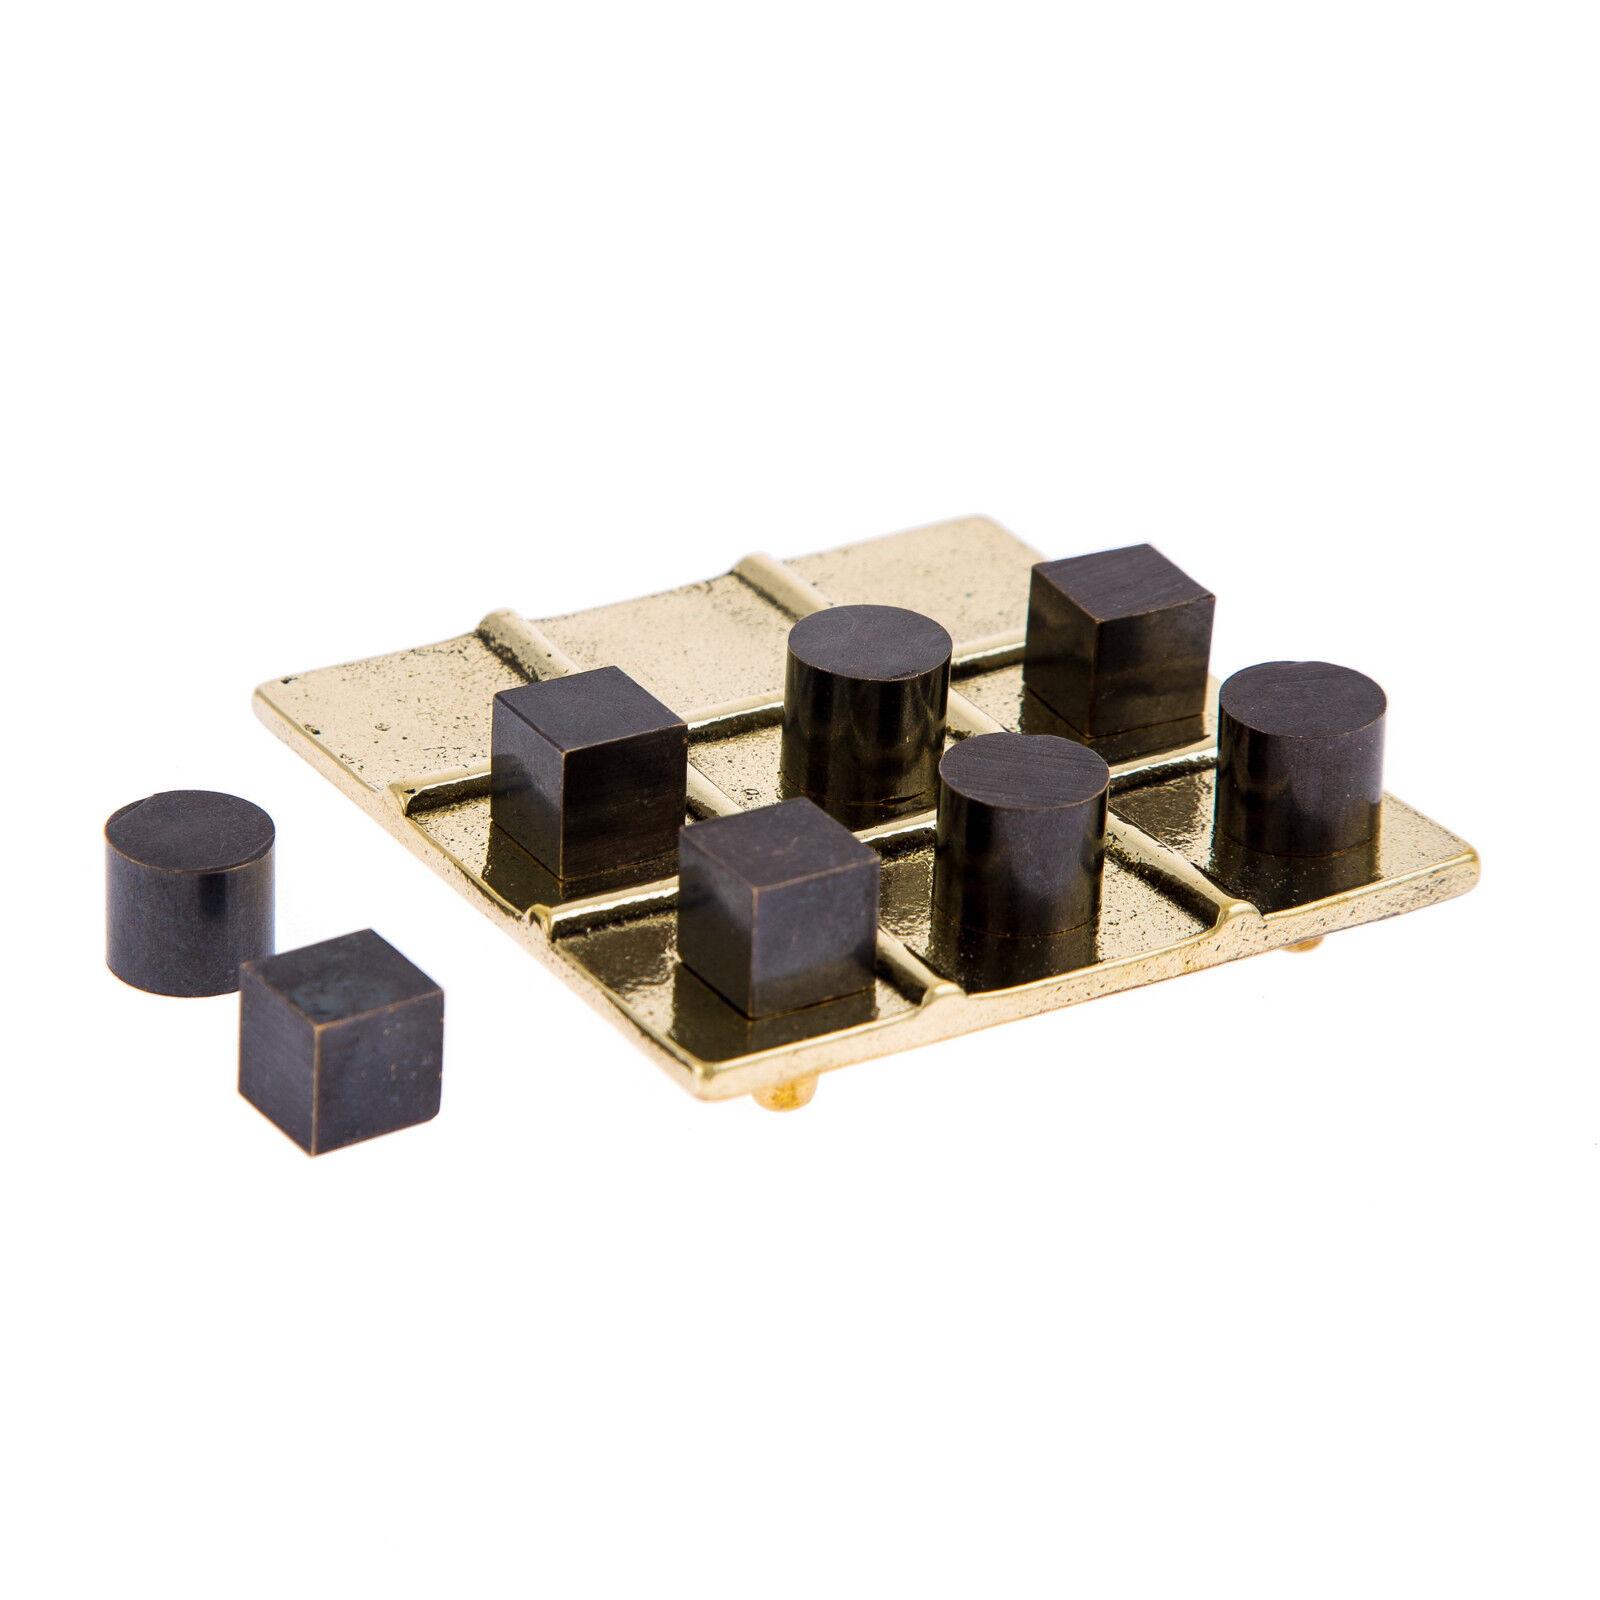 Tic Tac Toe Board Game - Decorative Handmade Bronze Metal Ornament- Gold & schwarz